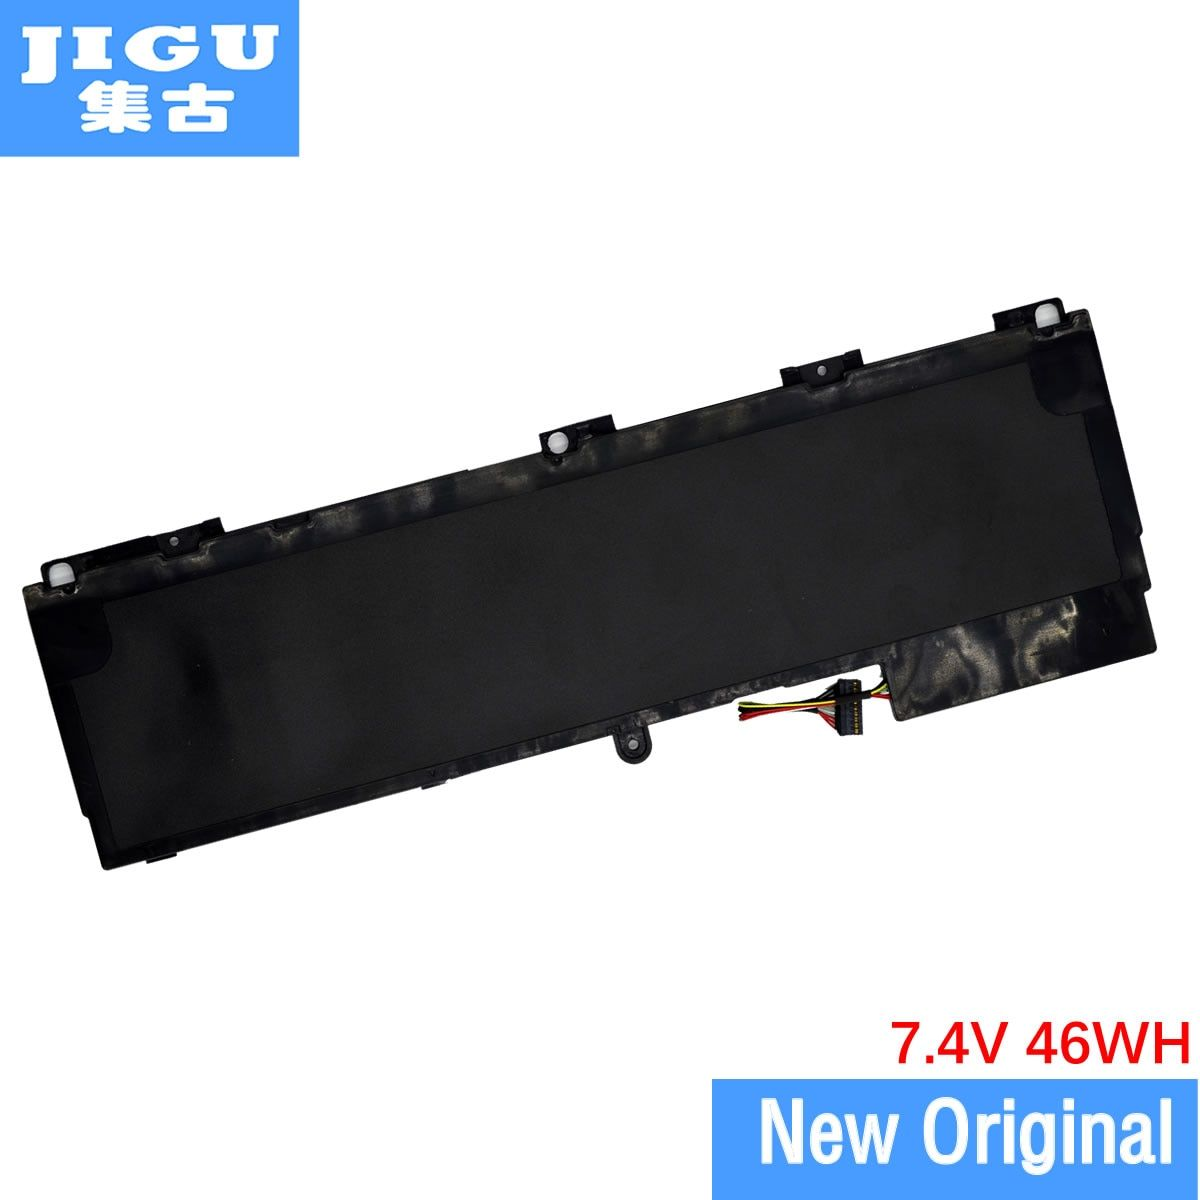 JIGU AAPLAN6AR AA-PLAN6AR Original-Laptop-Batterie Für SAMSUNG 900X1AA01US 900X3A-01IT B04CH NP900X3A 900X1BA03 SERIE